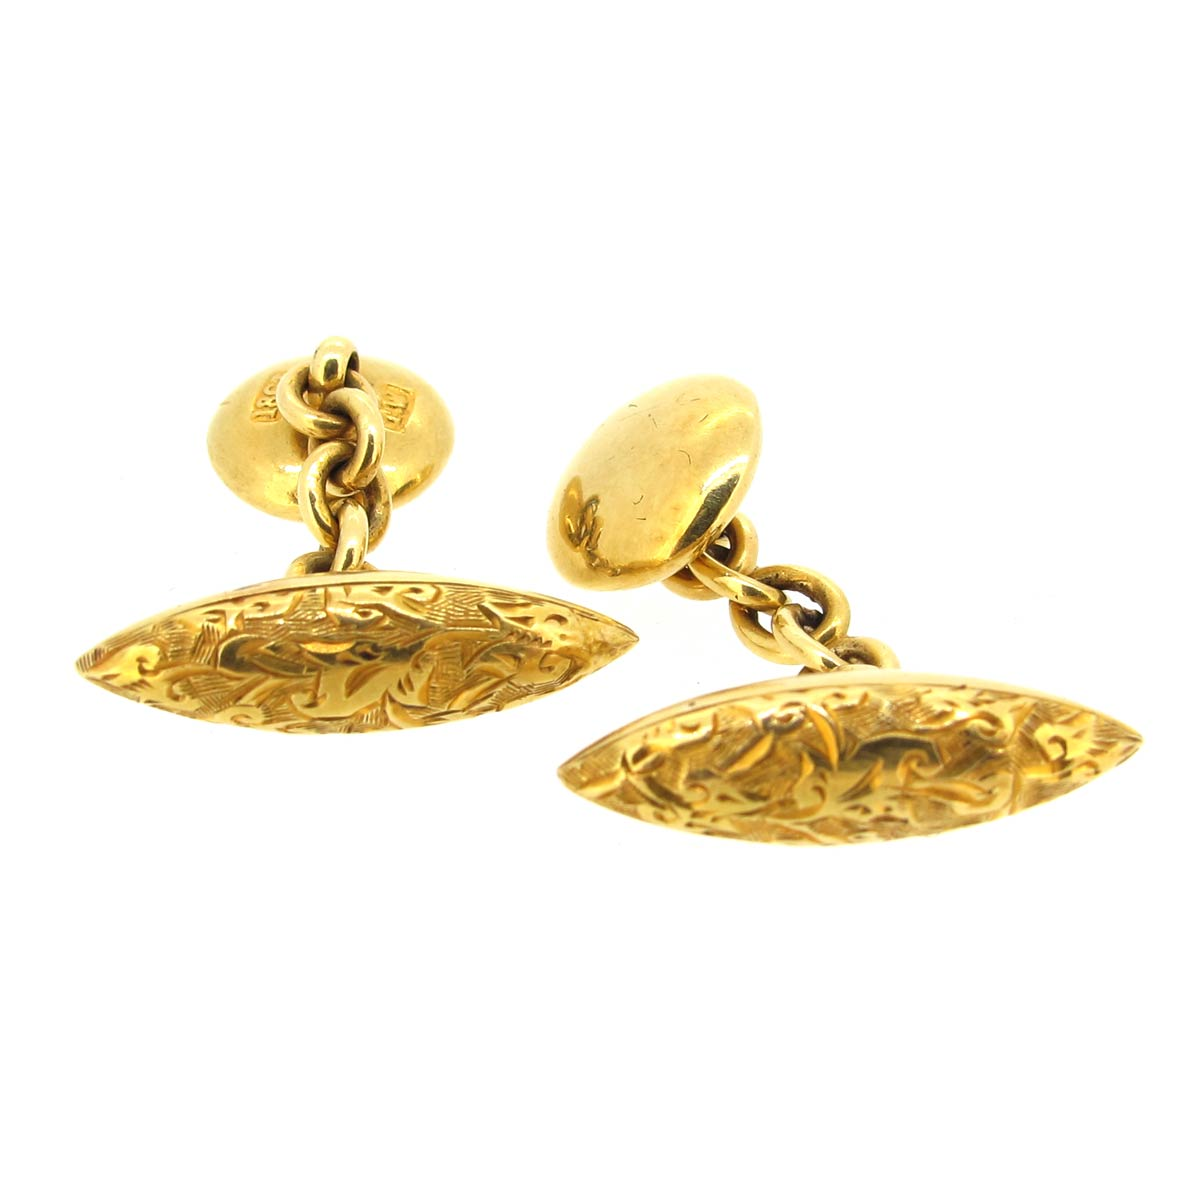 Gold Torpedo Cufflinks